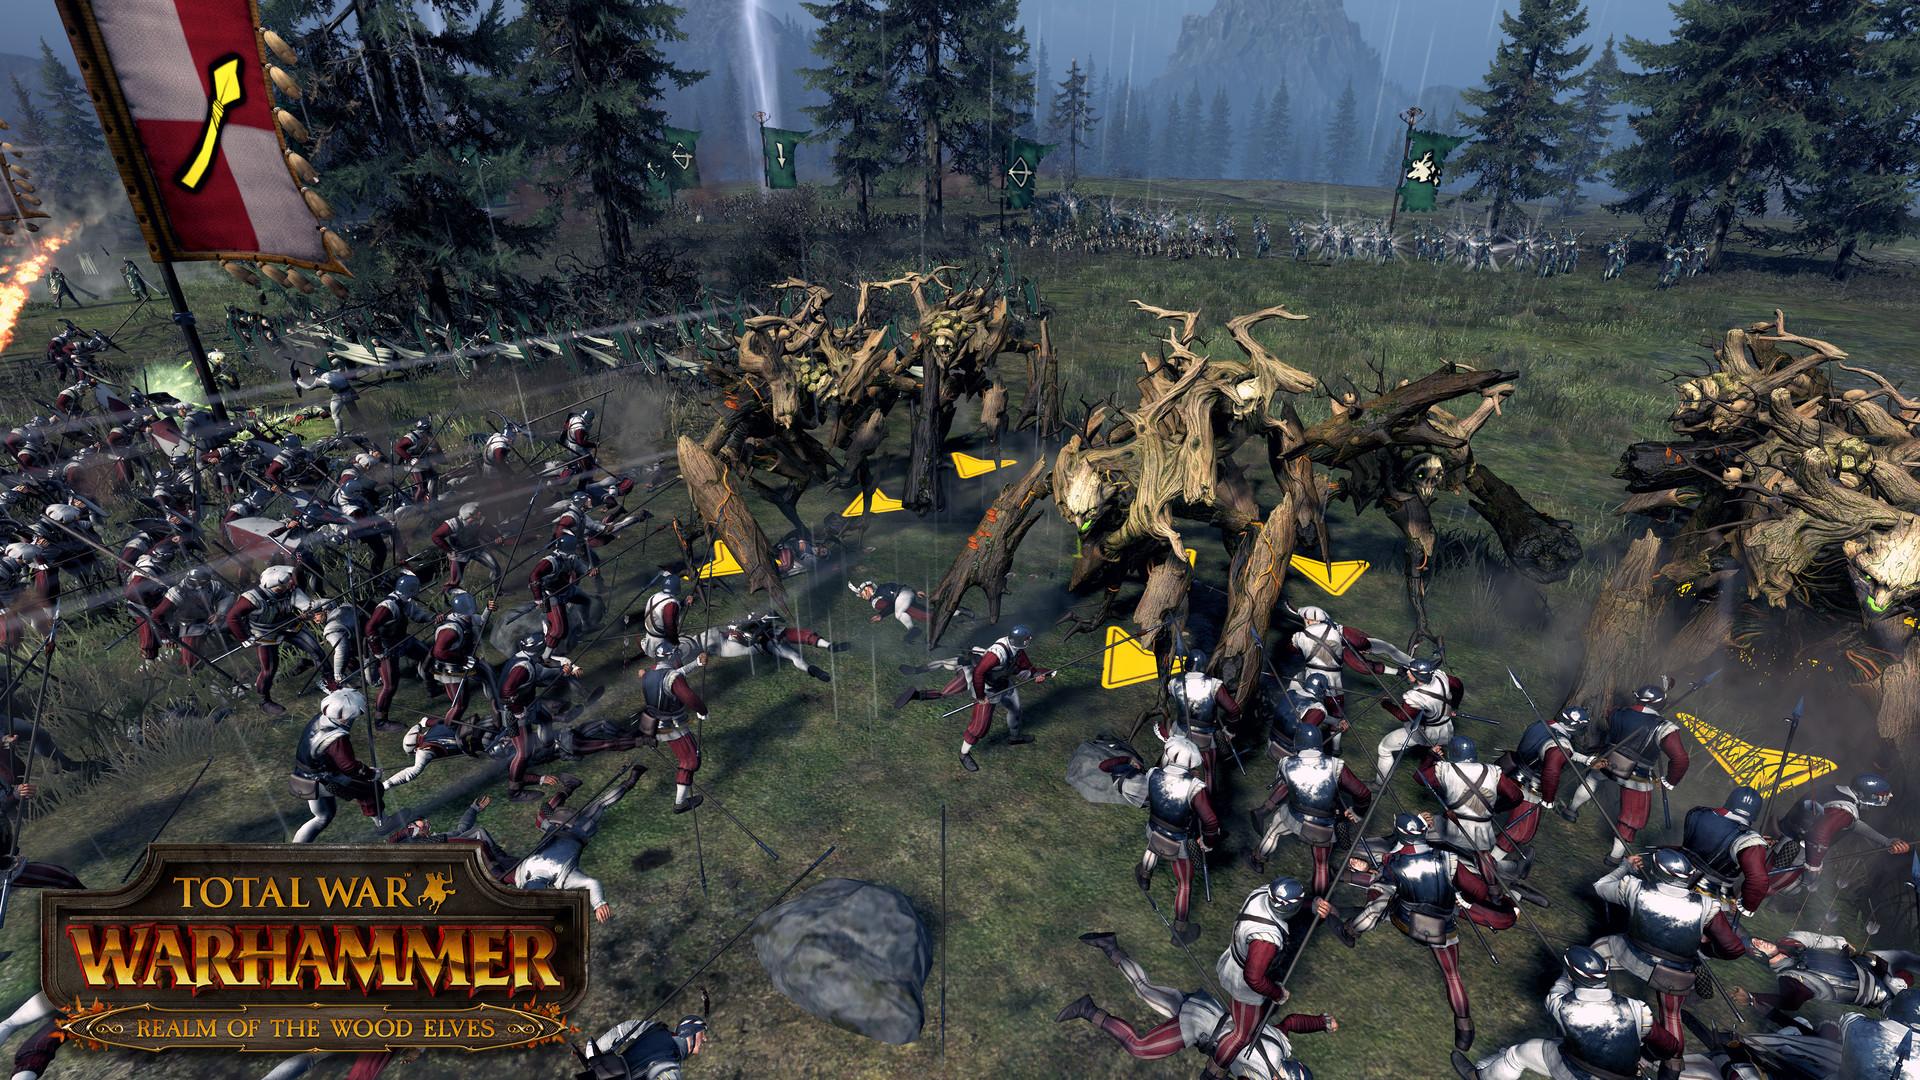 Warhammer Total War ! - Page 2 Ss_529efdfc7142af8bd44fb828eb7b77ef8faa6649.1920x1080